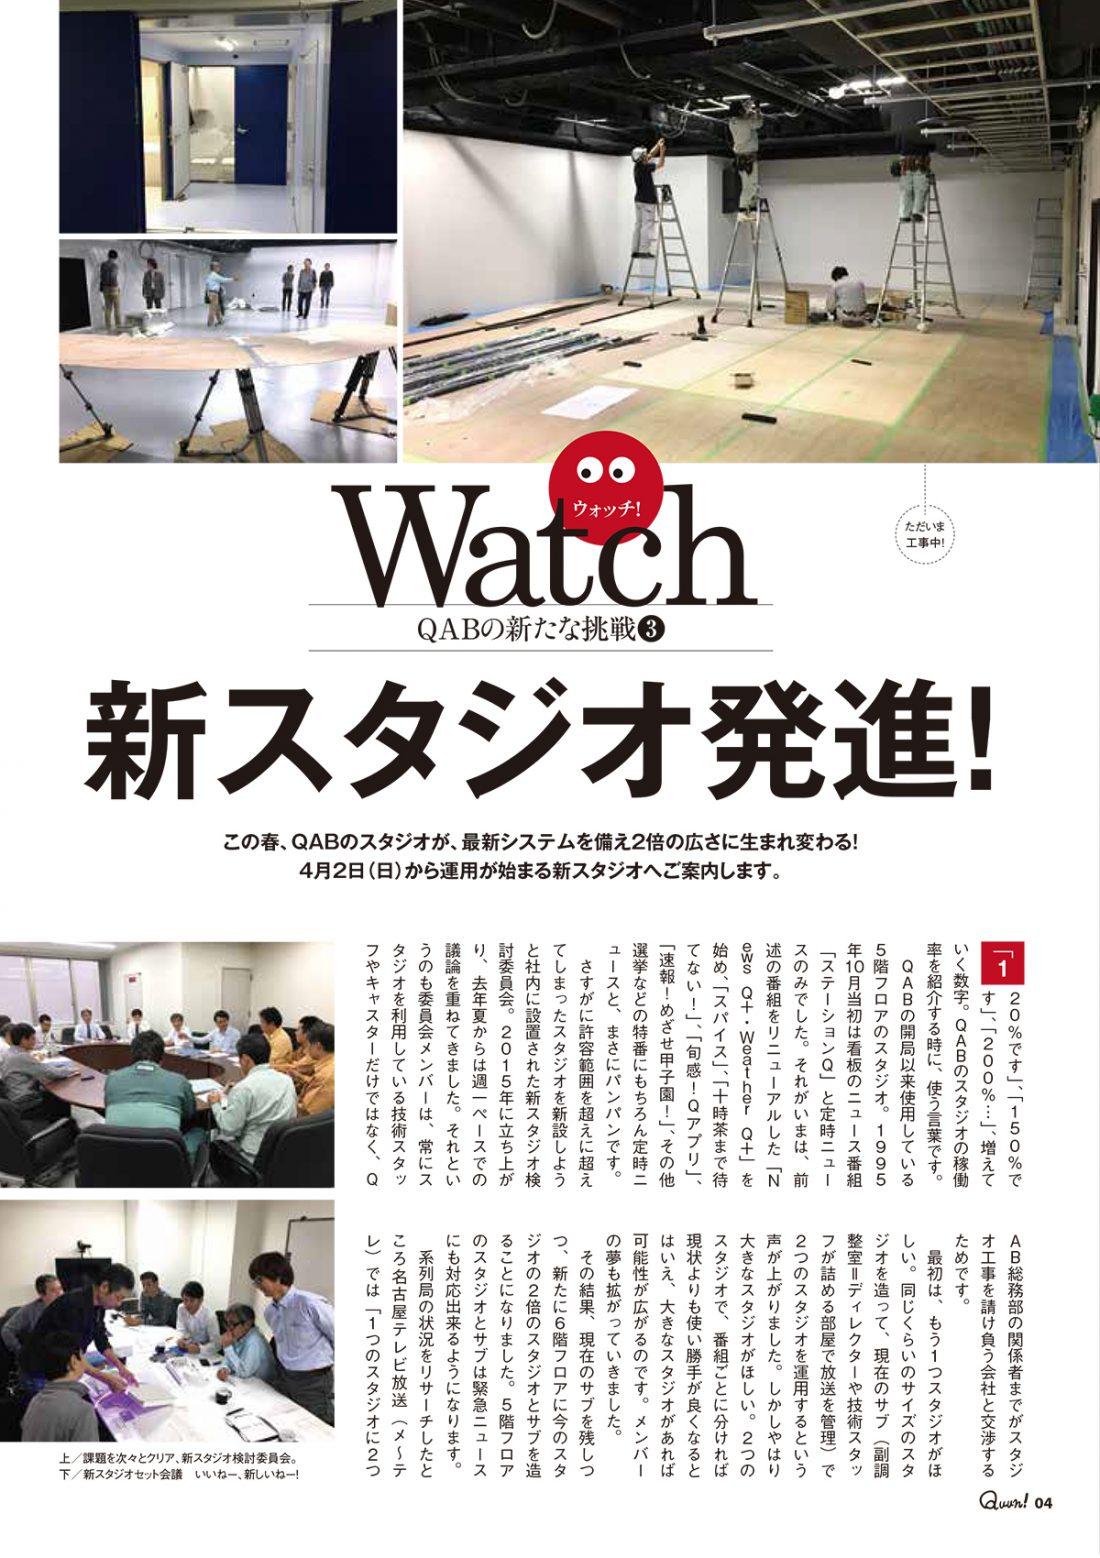 http://www.qab.co.jp/qgoro/wp-content/uploads/quun_0706-1100x1558.jpg